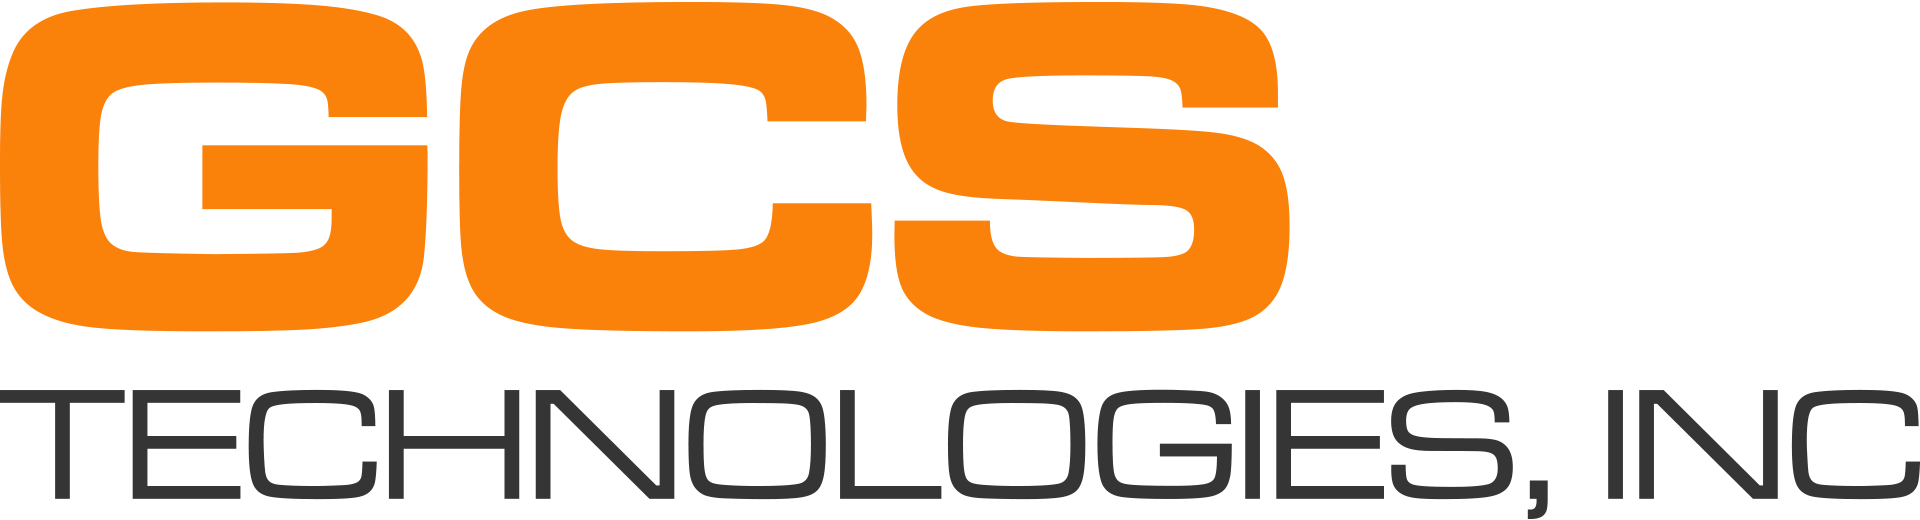 GCS Technologies, Inc. logo